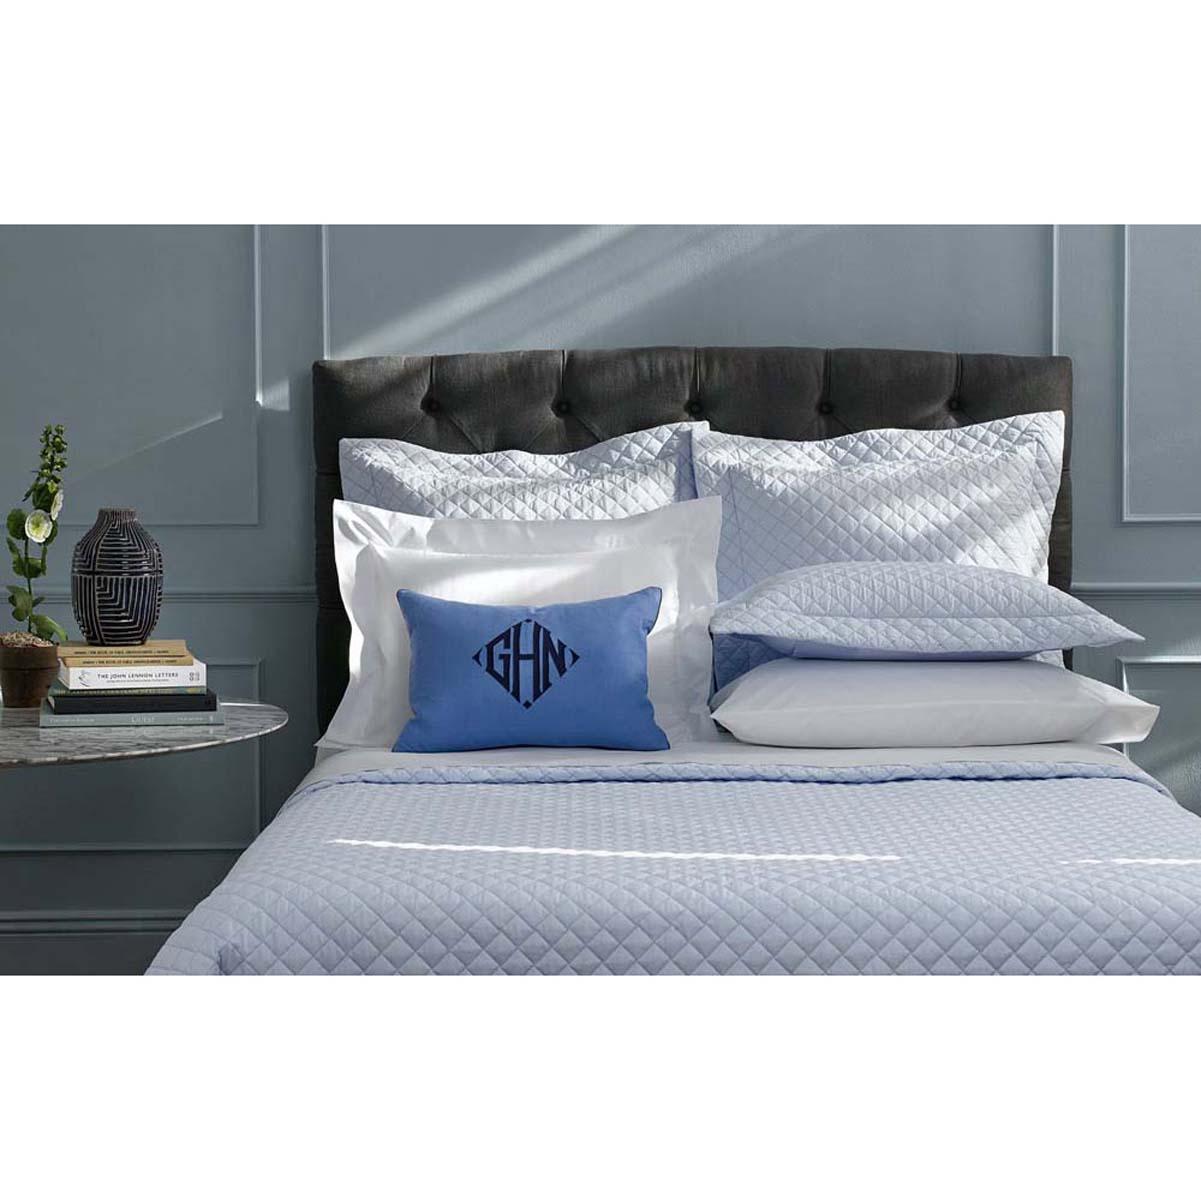 Gemma Luxury Bed Linens By Matouk